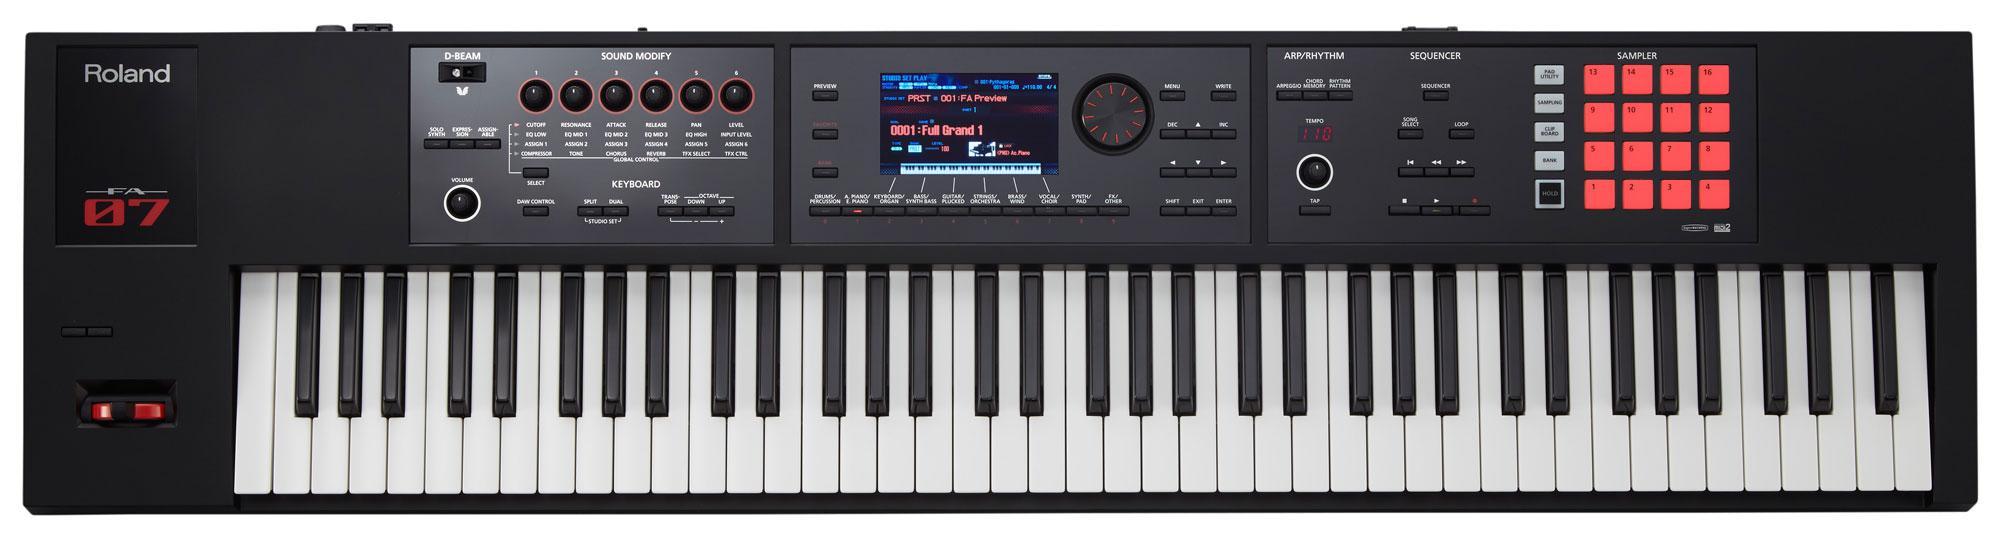 Synthesizer - Roland FA 07 Synthesizer Workstation - Onlineshop Musikhaus Kirstein